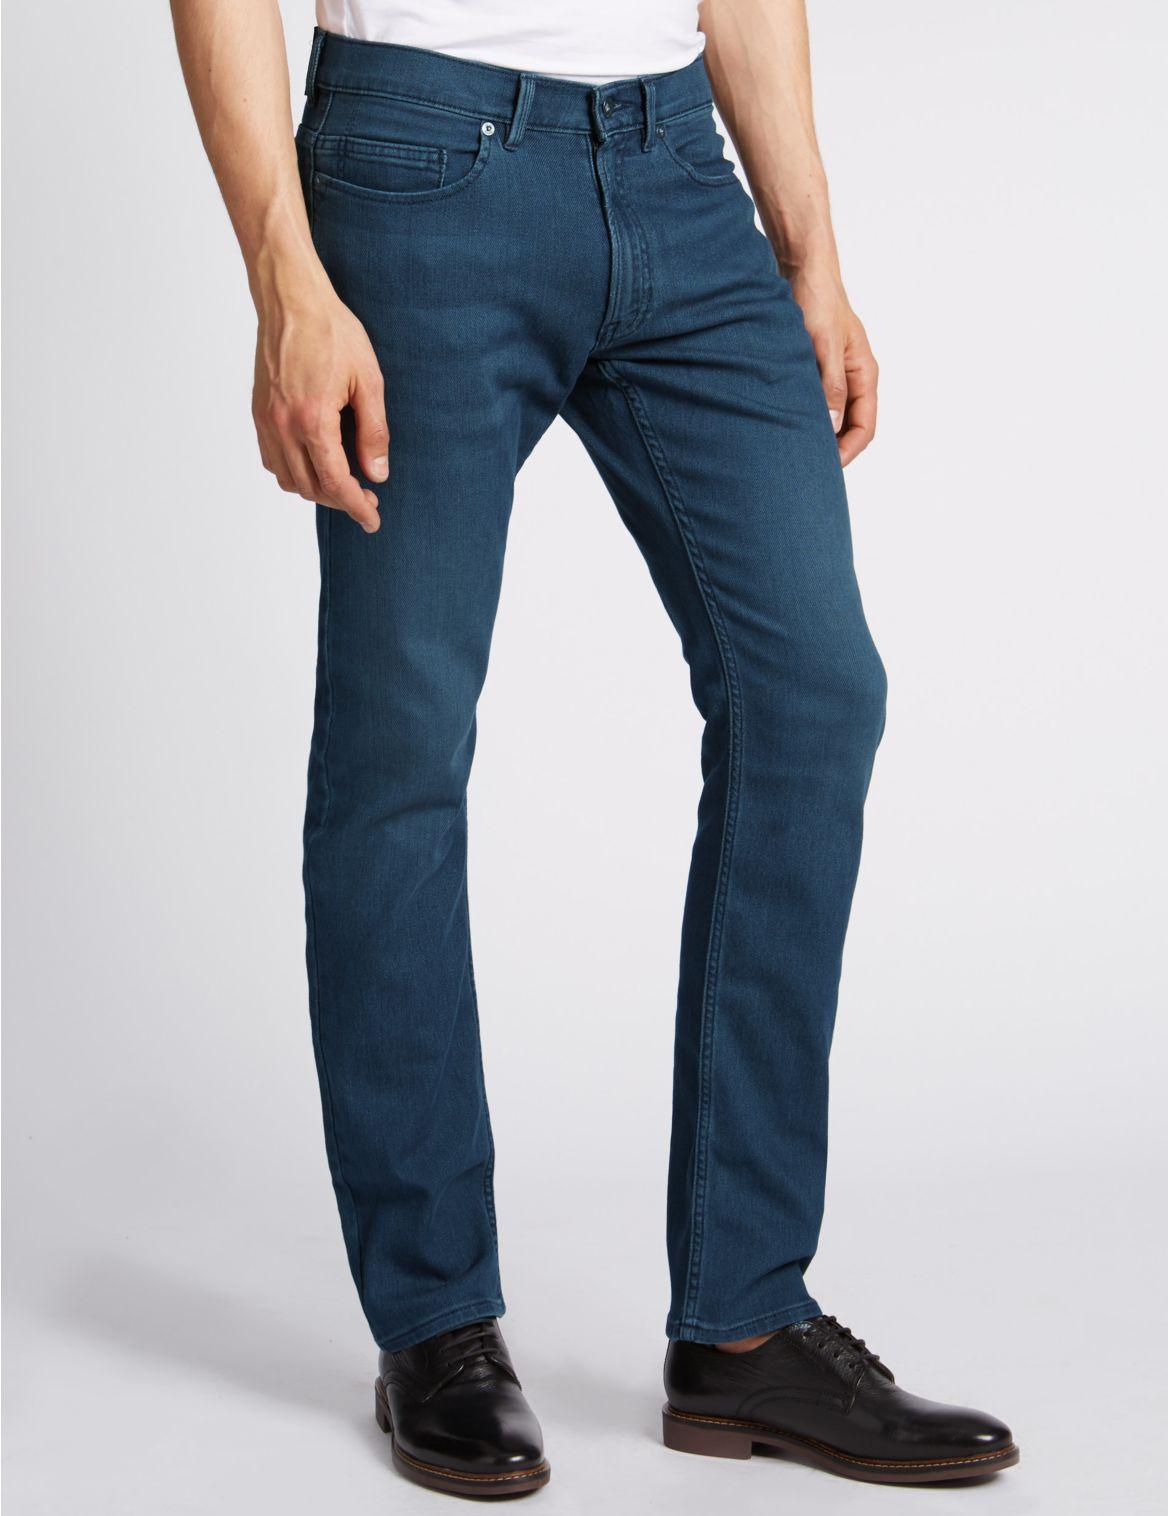 Jeans met slanke pasvorm